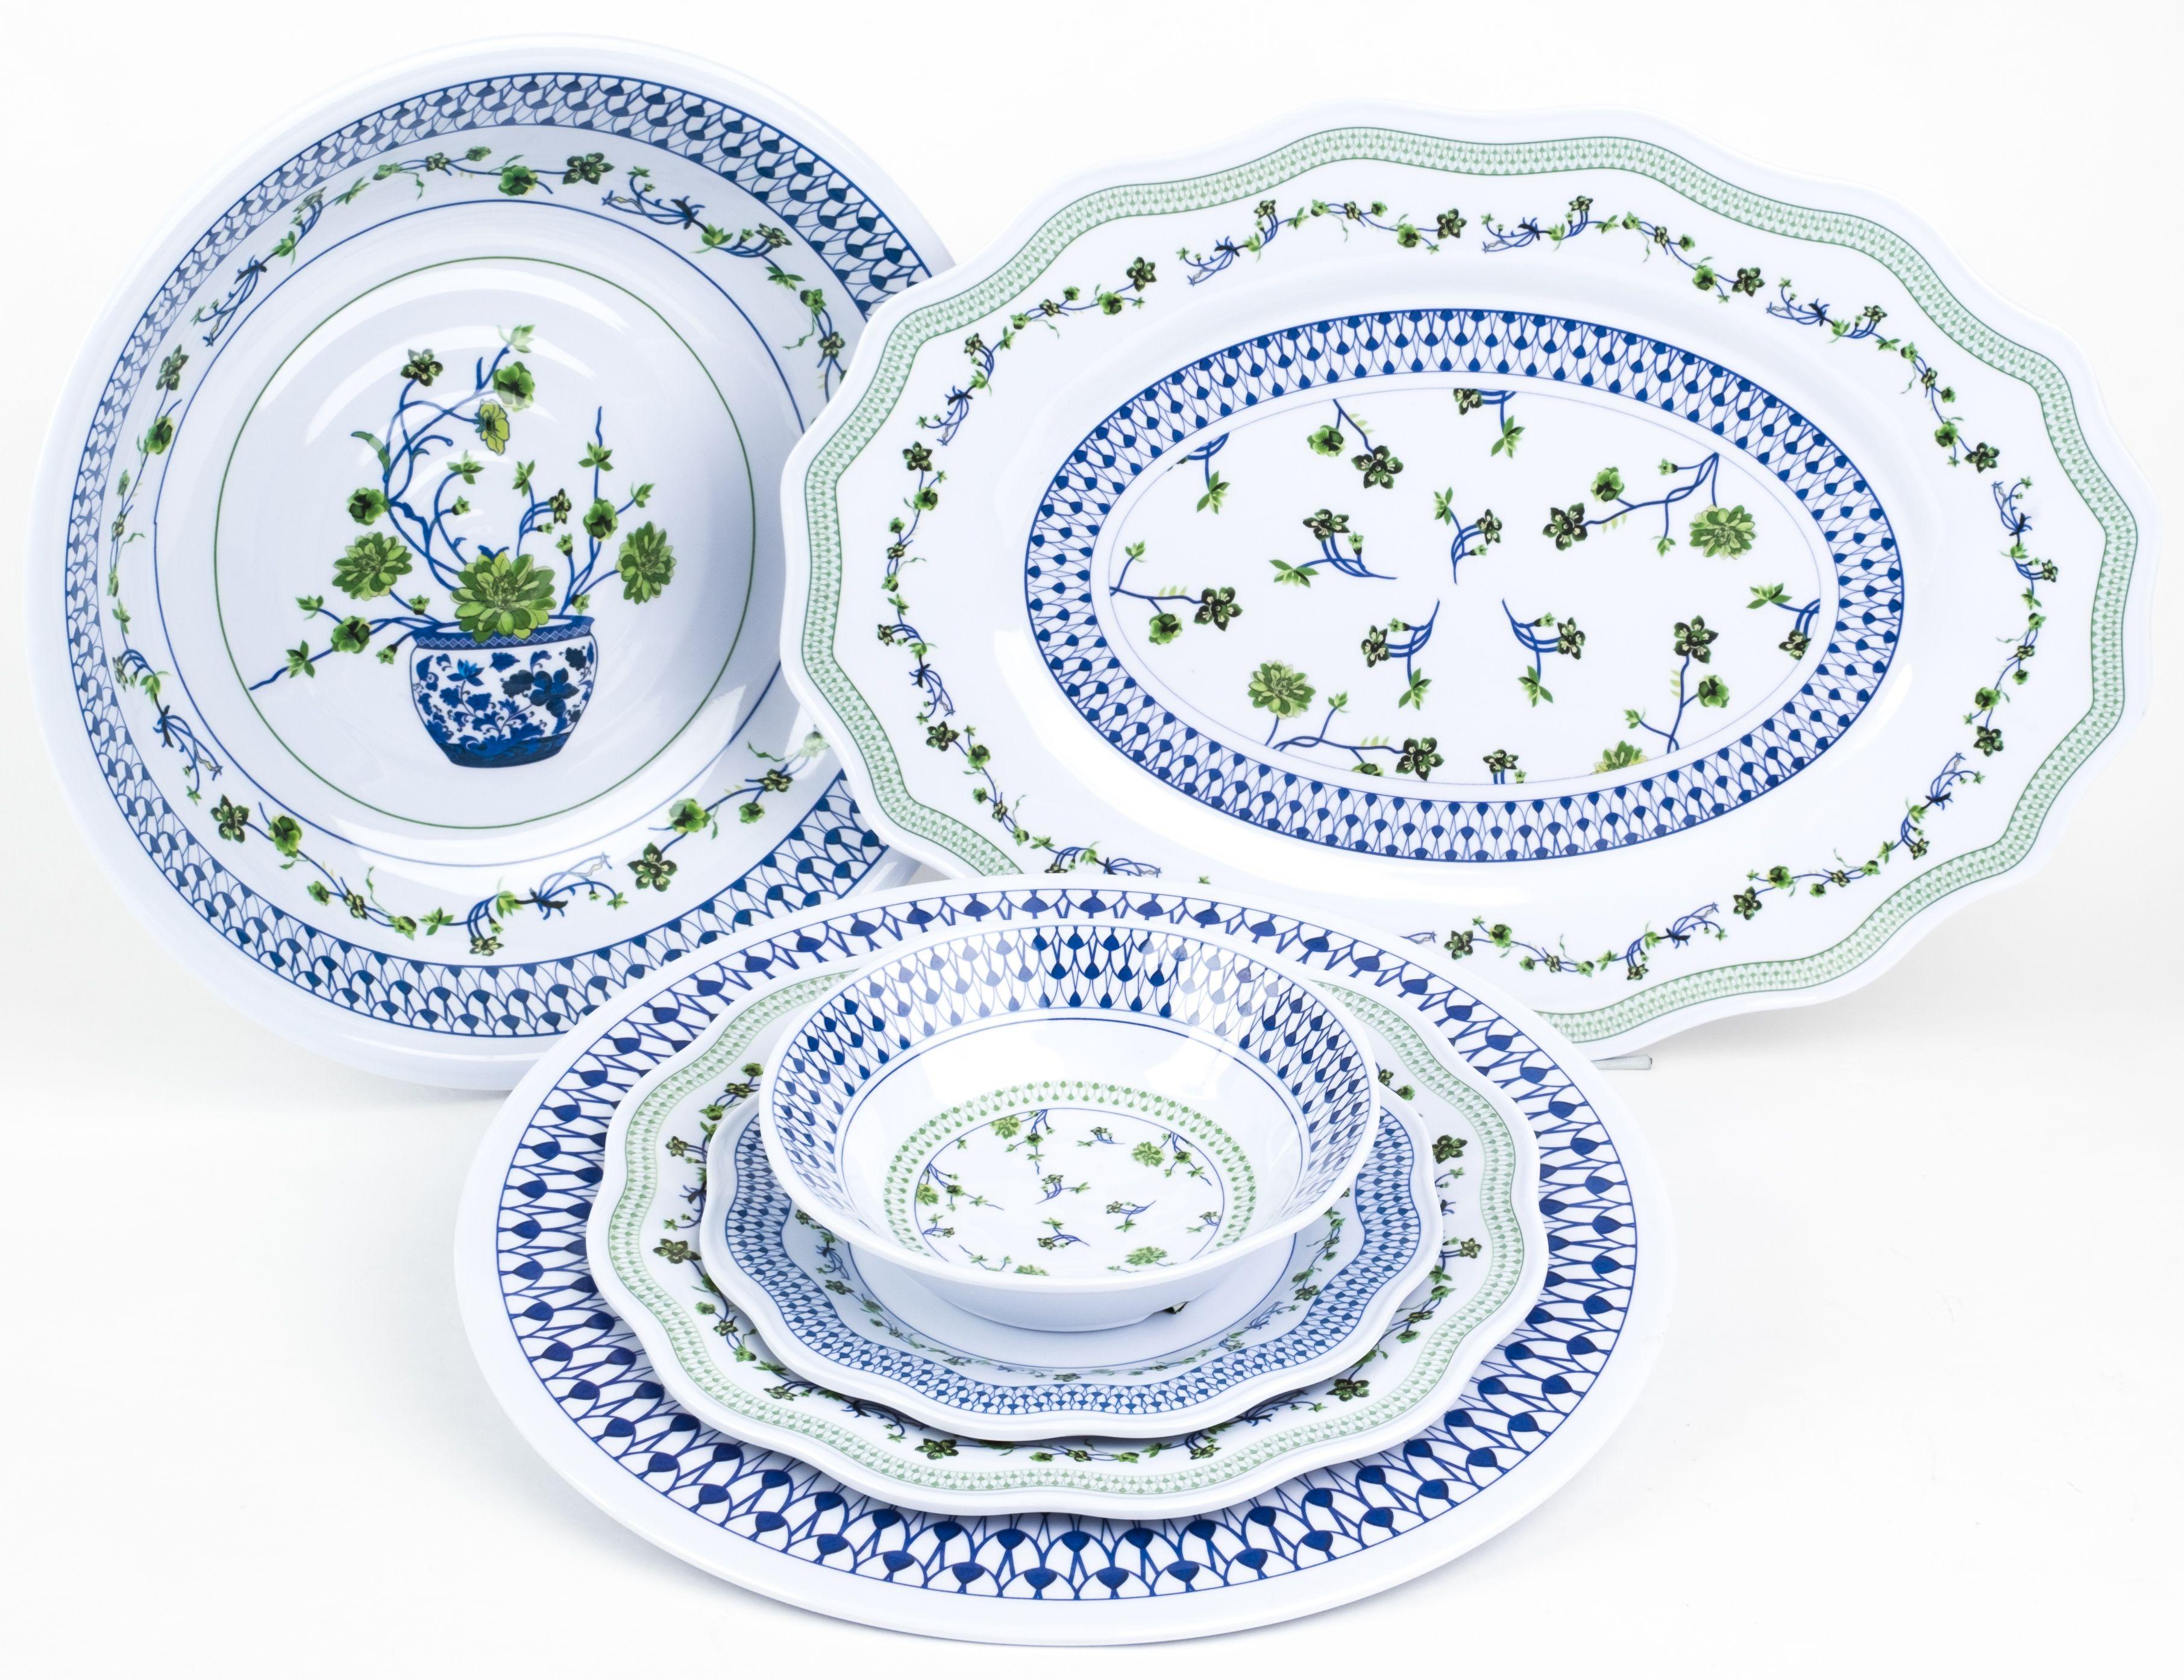 Fabulous Green Blue Floral Melamine Starting At 22 Enchanted Home Floral Melamine White Dish Set